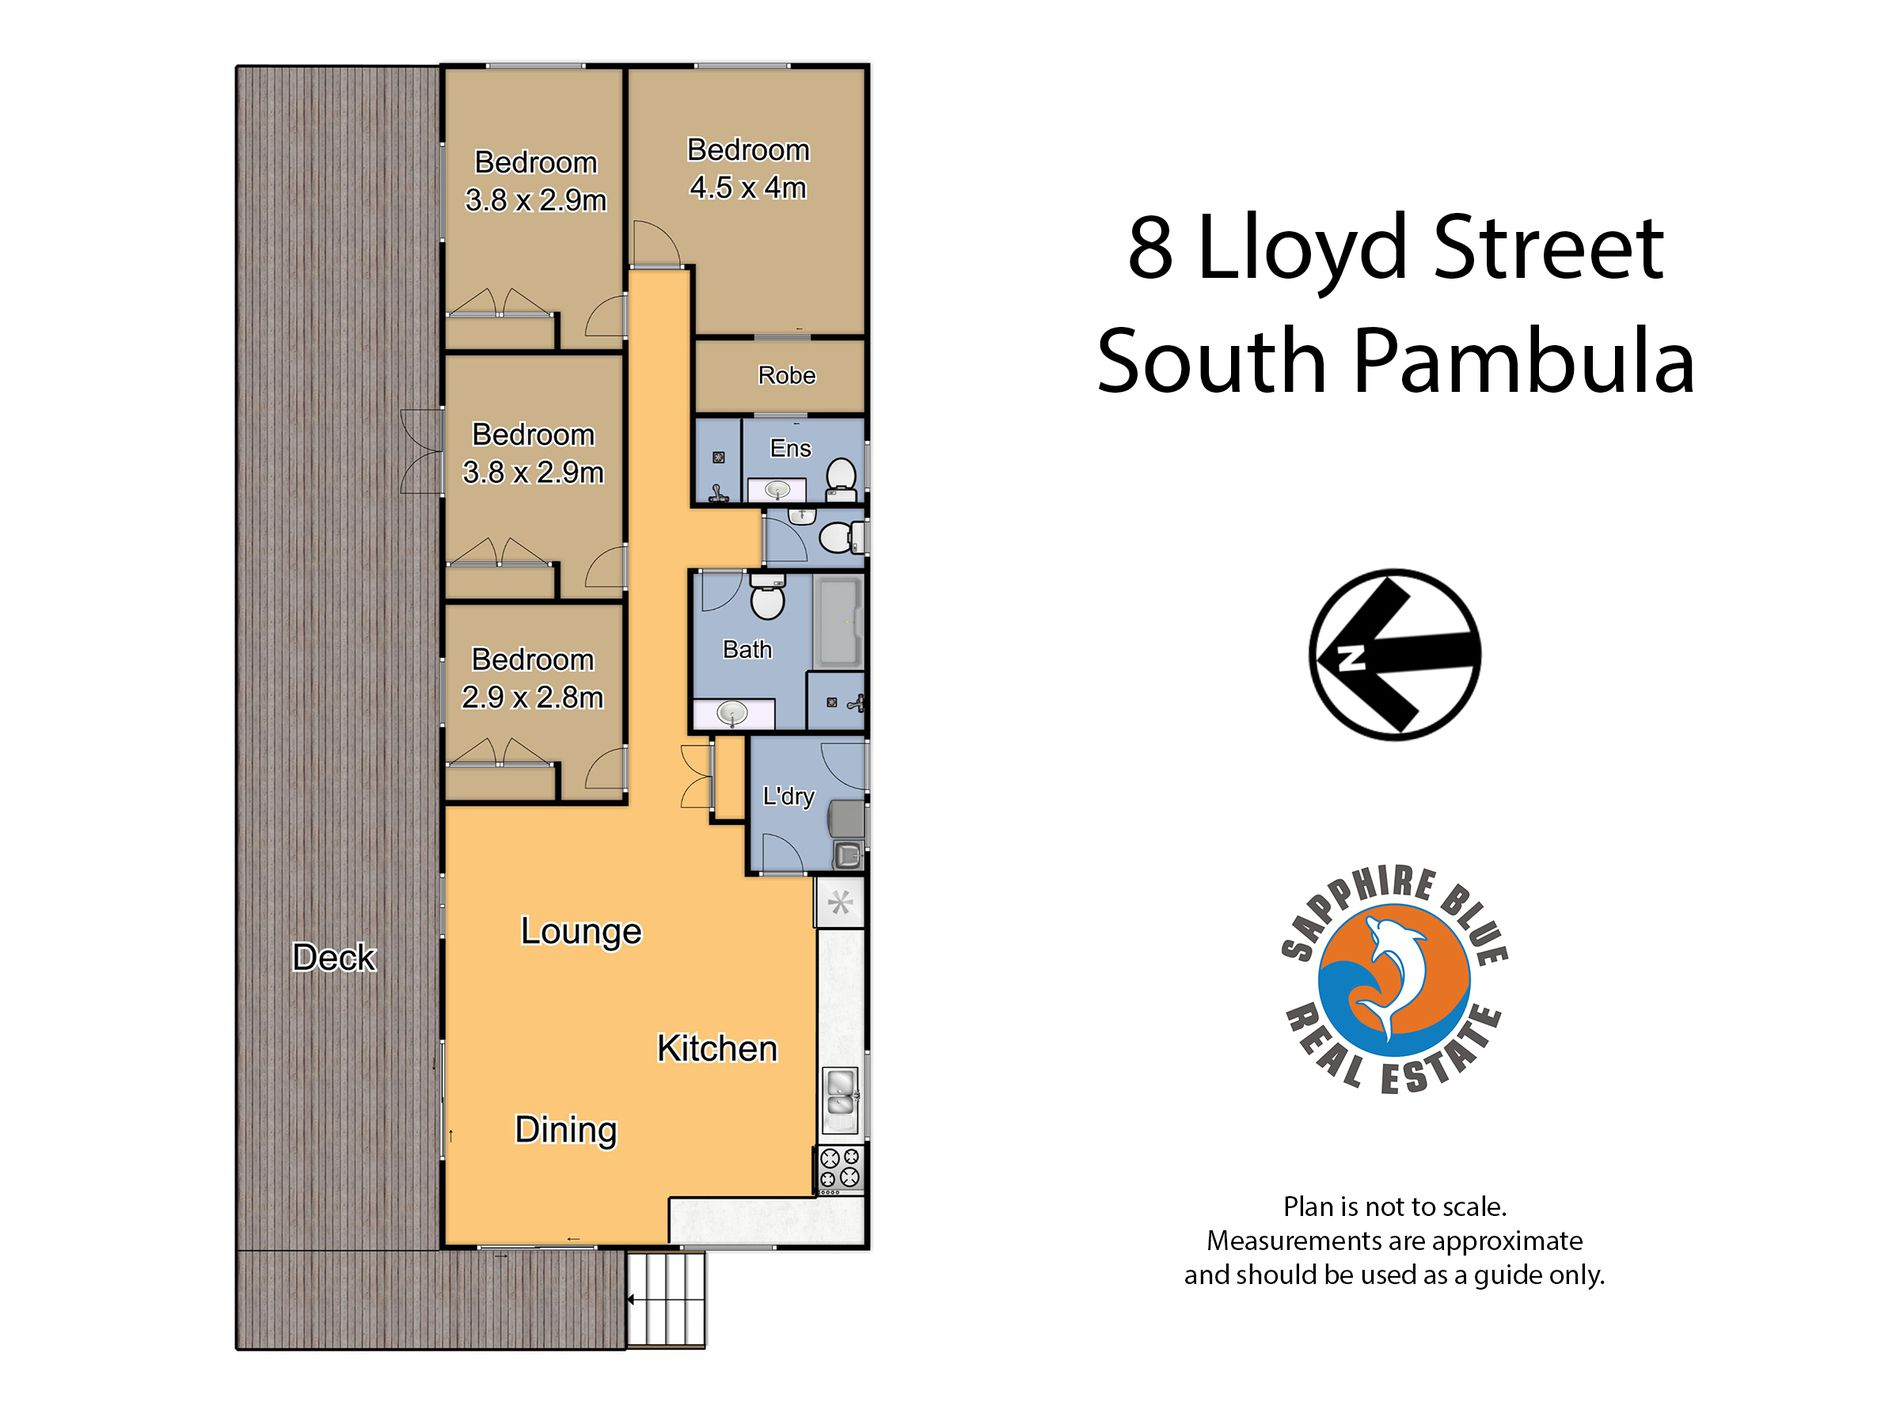 8 Lloyd Street, South Pambula